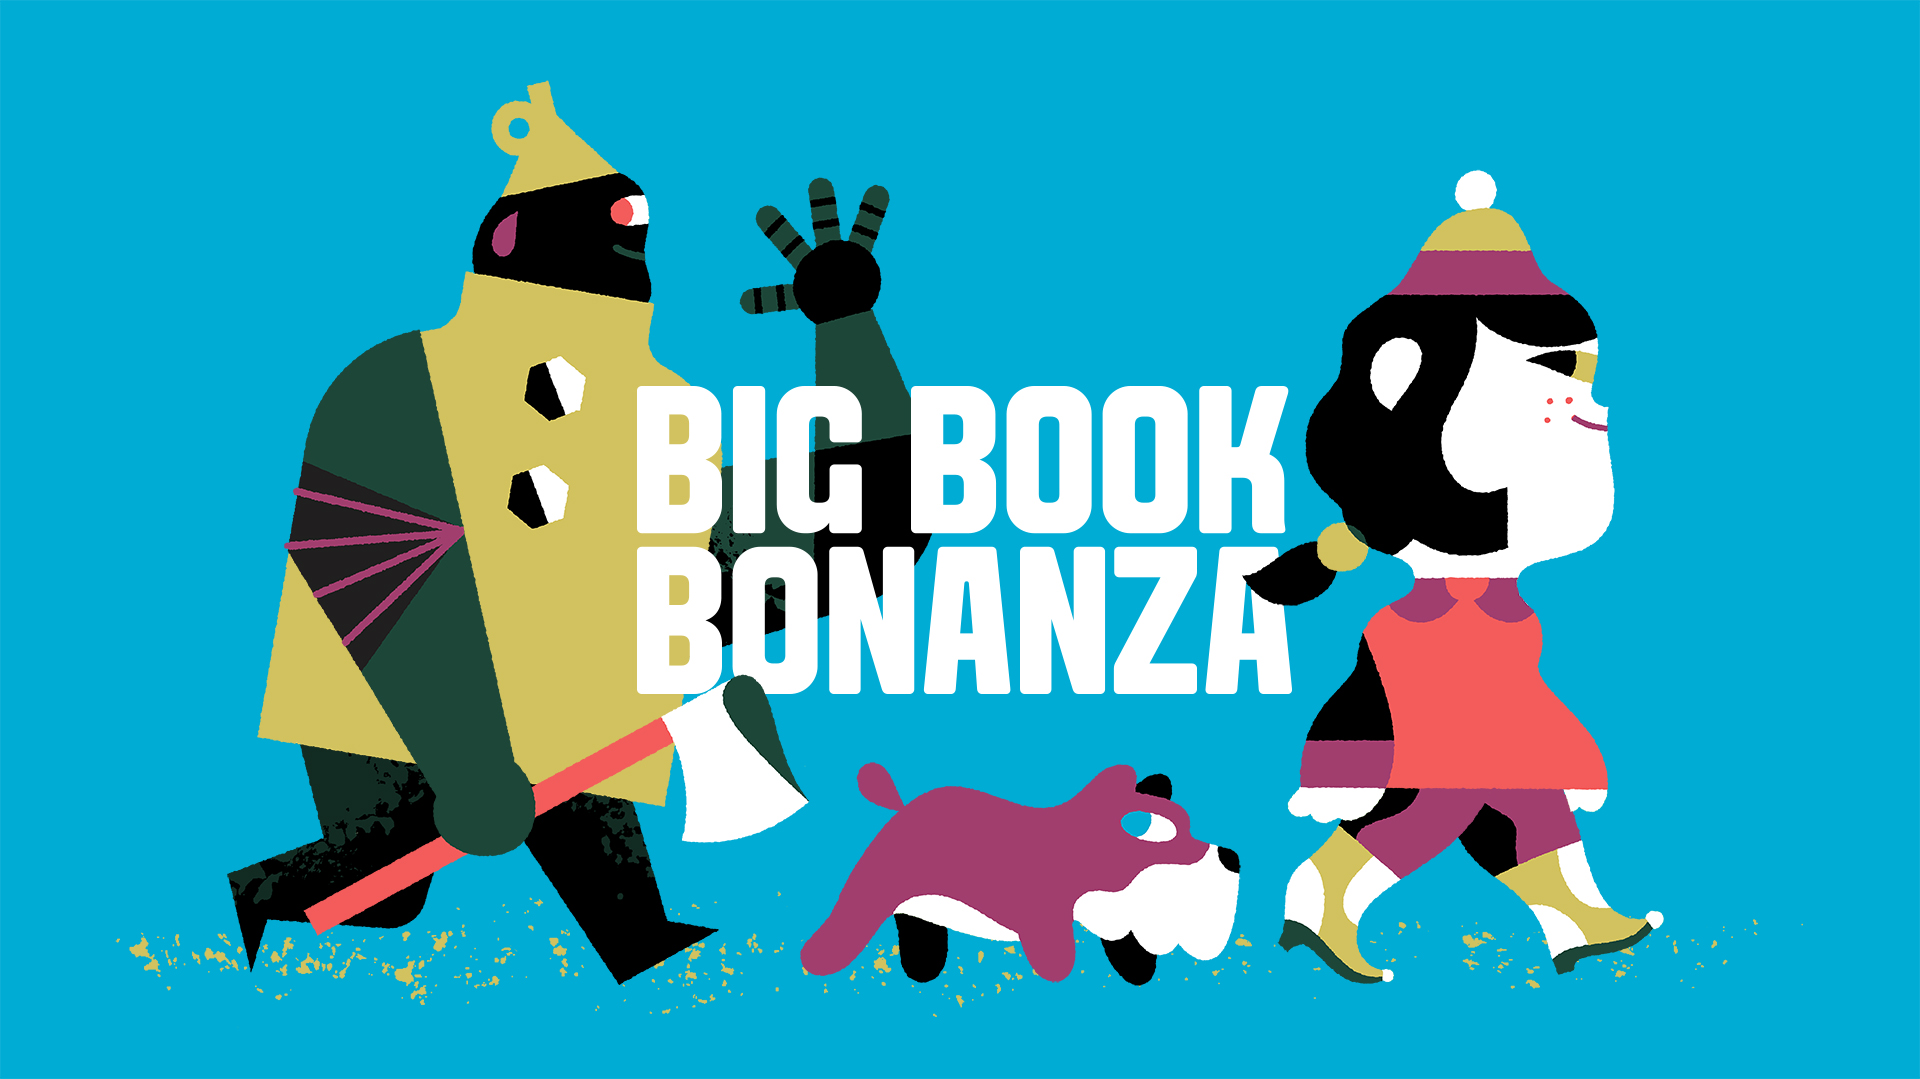 Hedof_Big Book Bonanza_Image_oz.jpg